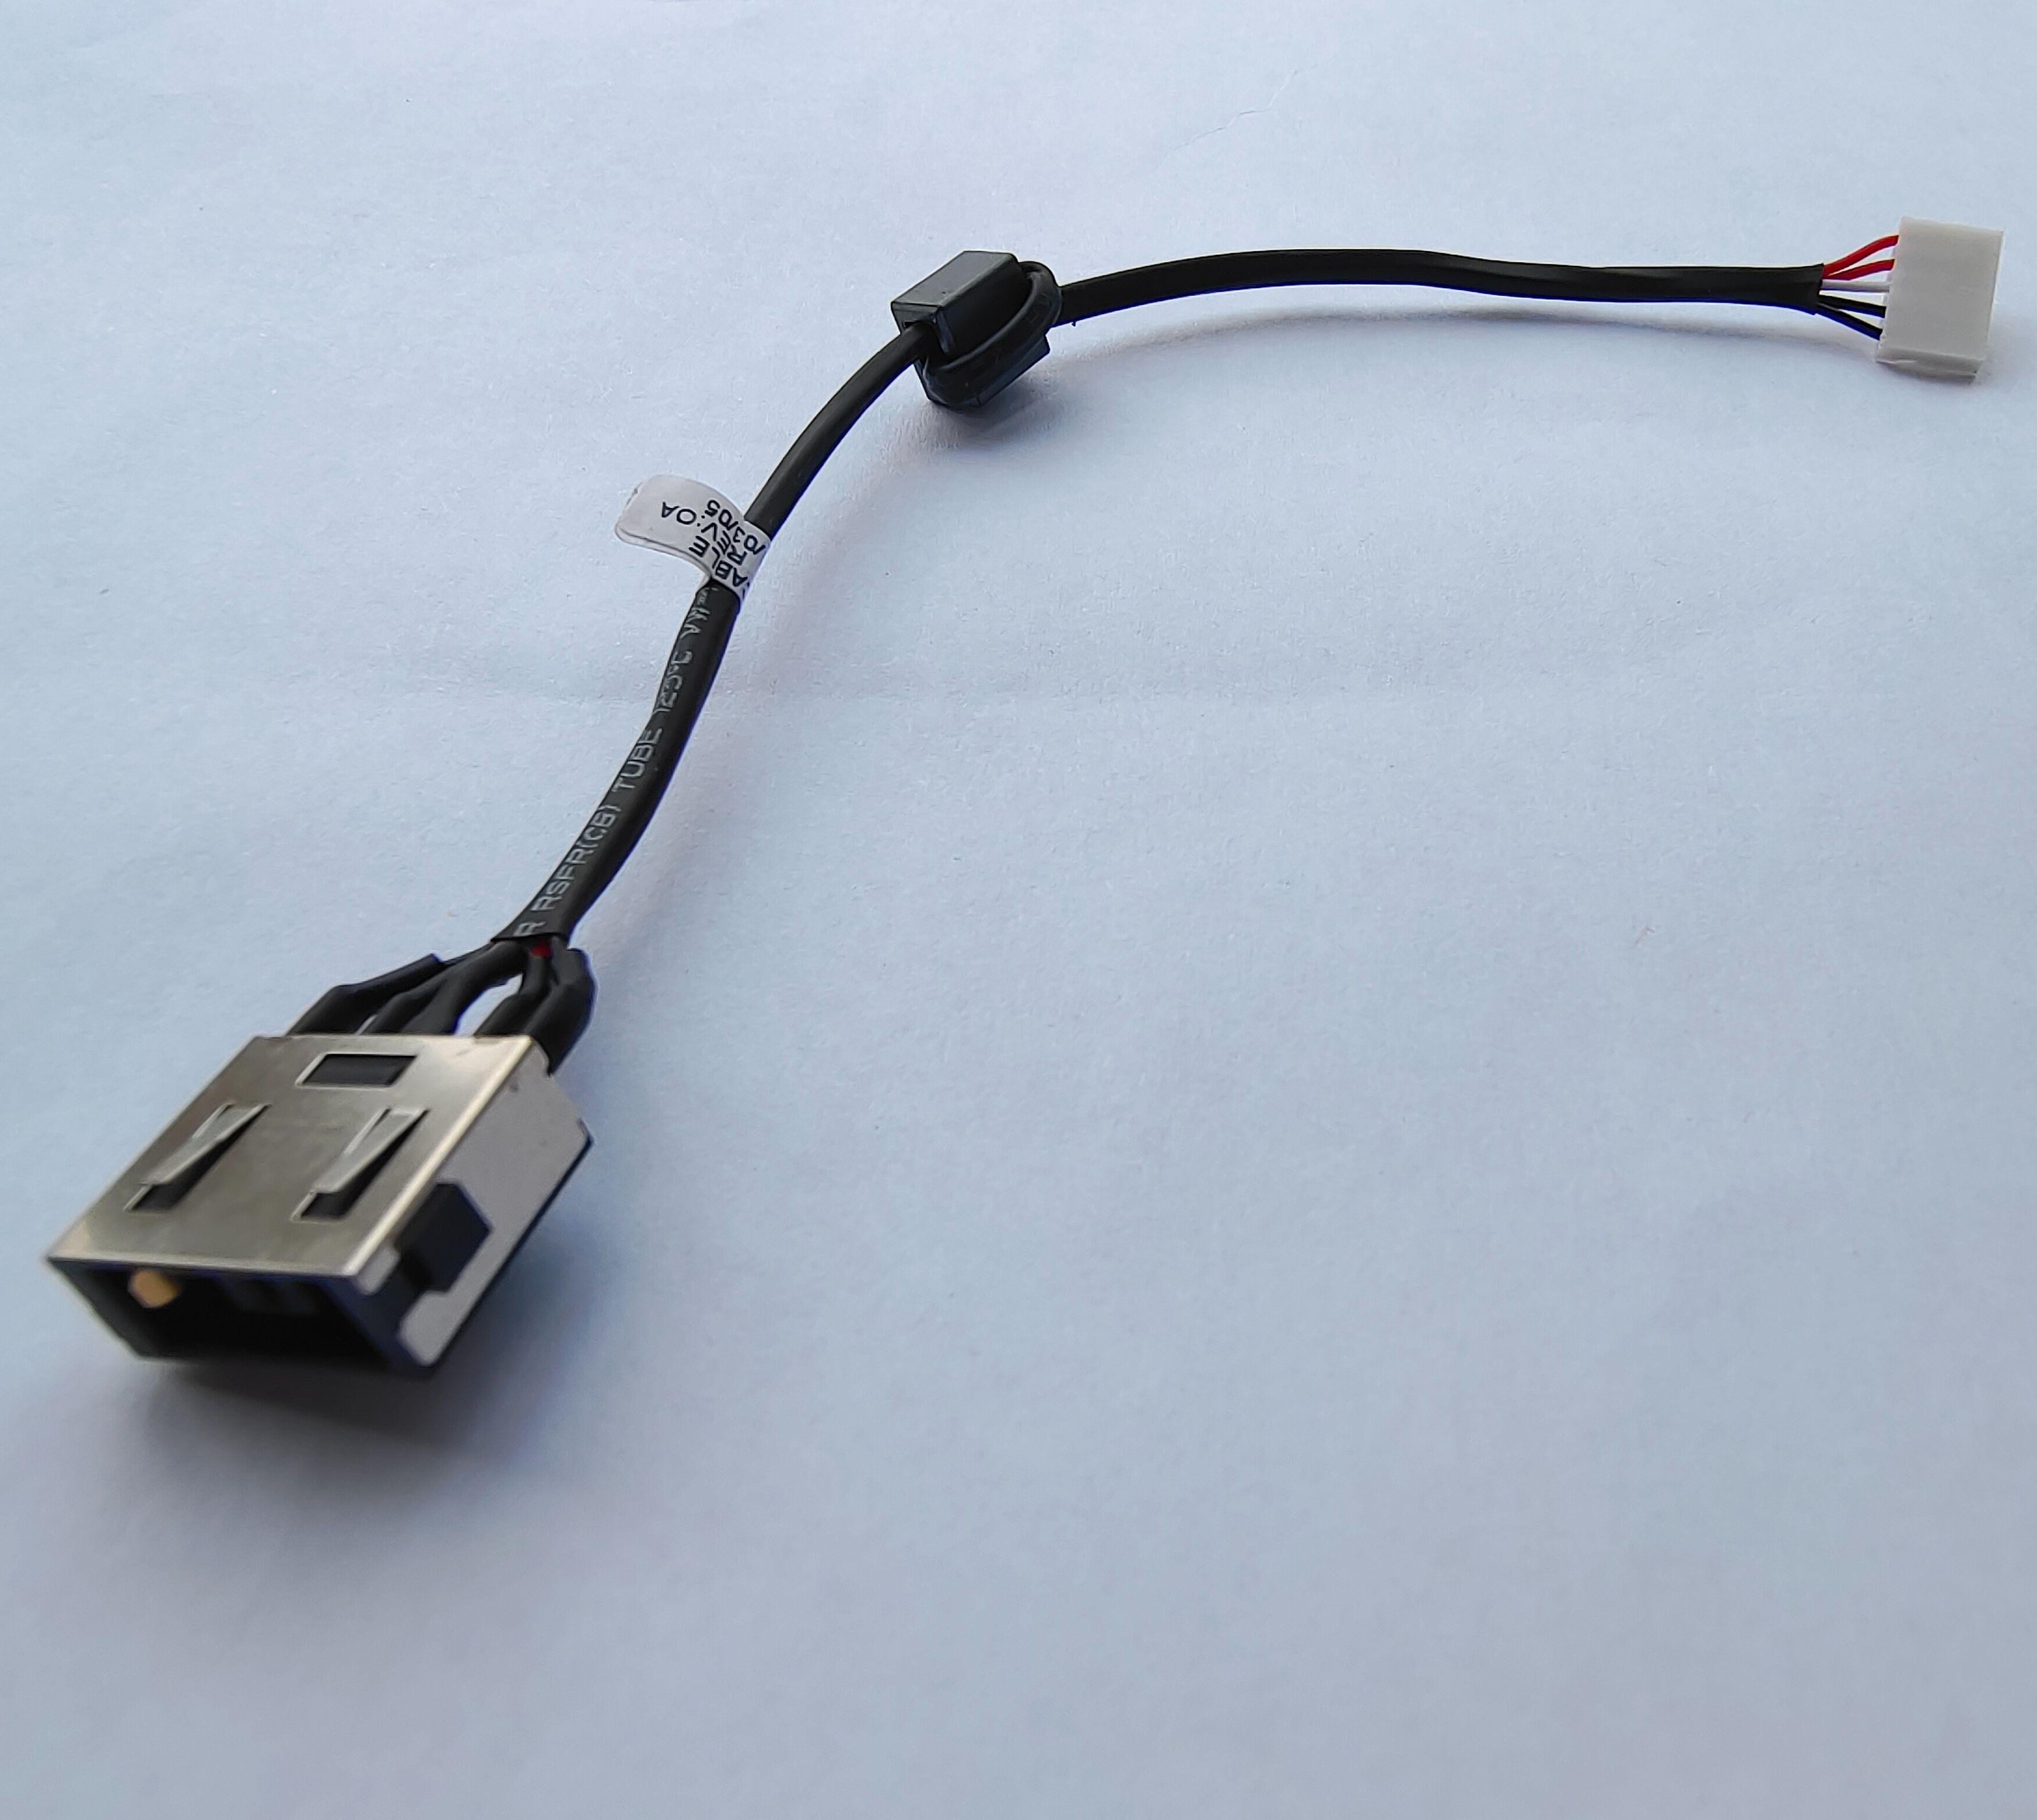 Зарядный кабель для Lenovo IdeaPad 300-14IBR 300-14ISK 300-15IBR 300-15ISK DC In